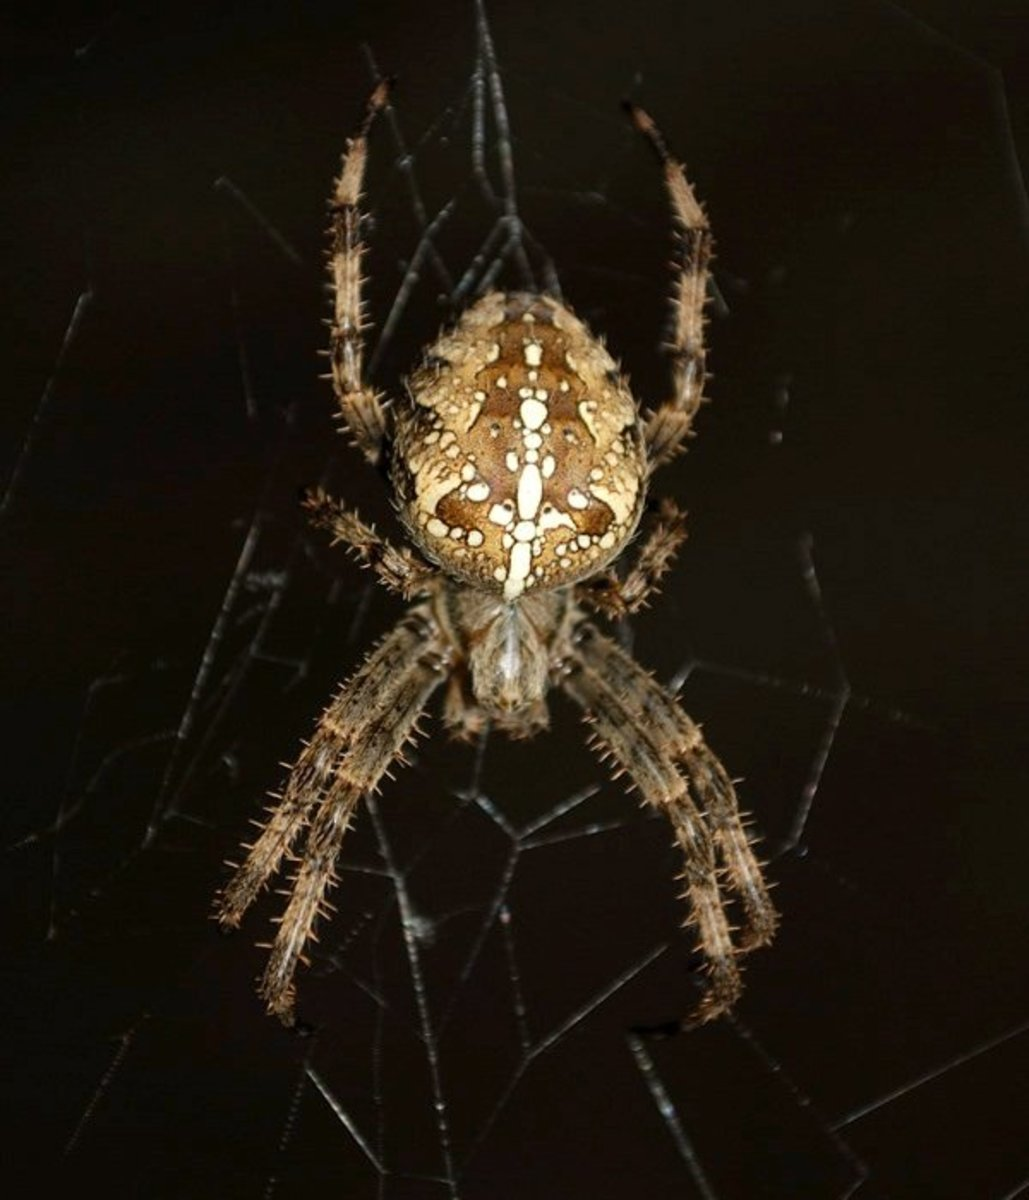 where - Common Garden Spider